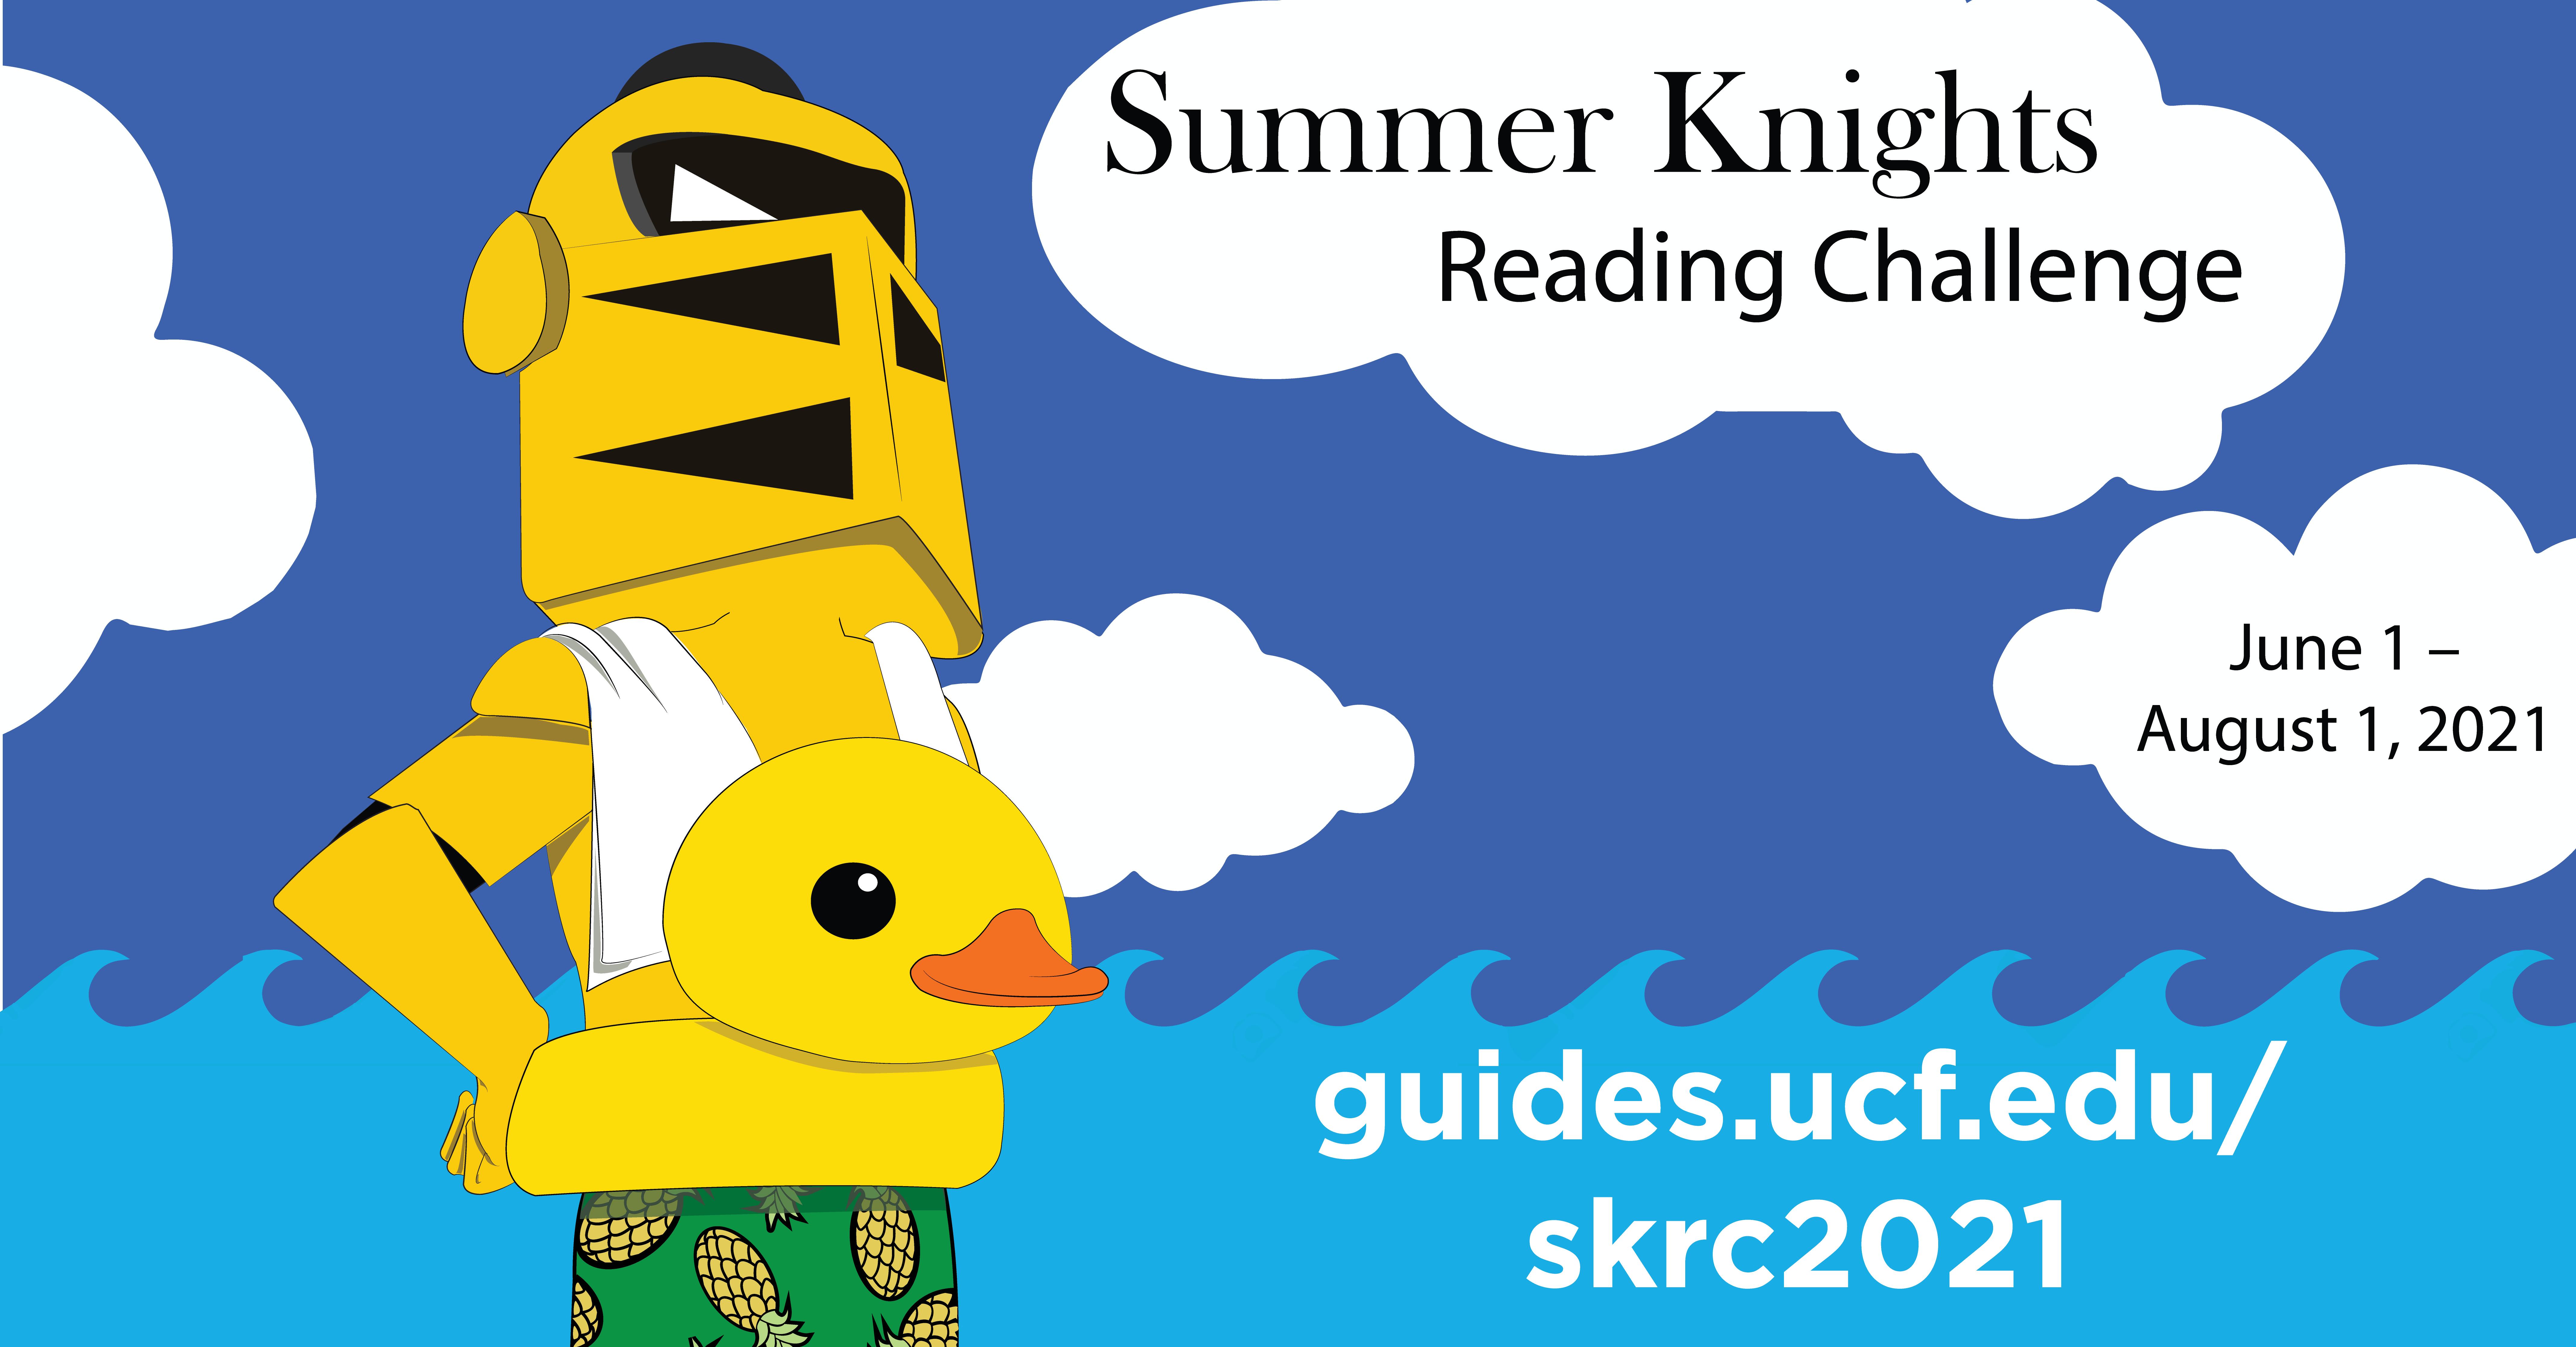 Summer Knights Reading Challenge June 1 - August 1, 2021 guides.ucf.edu/skrc2021